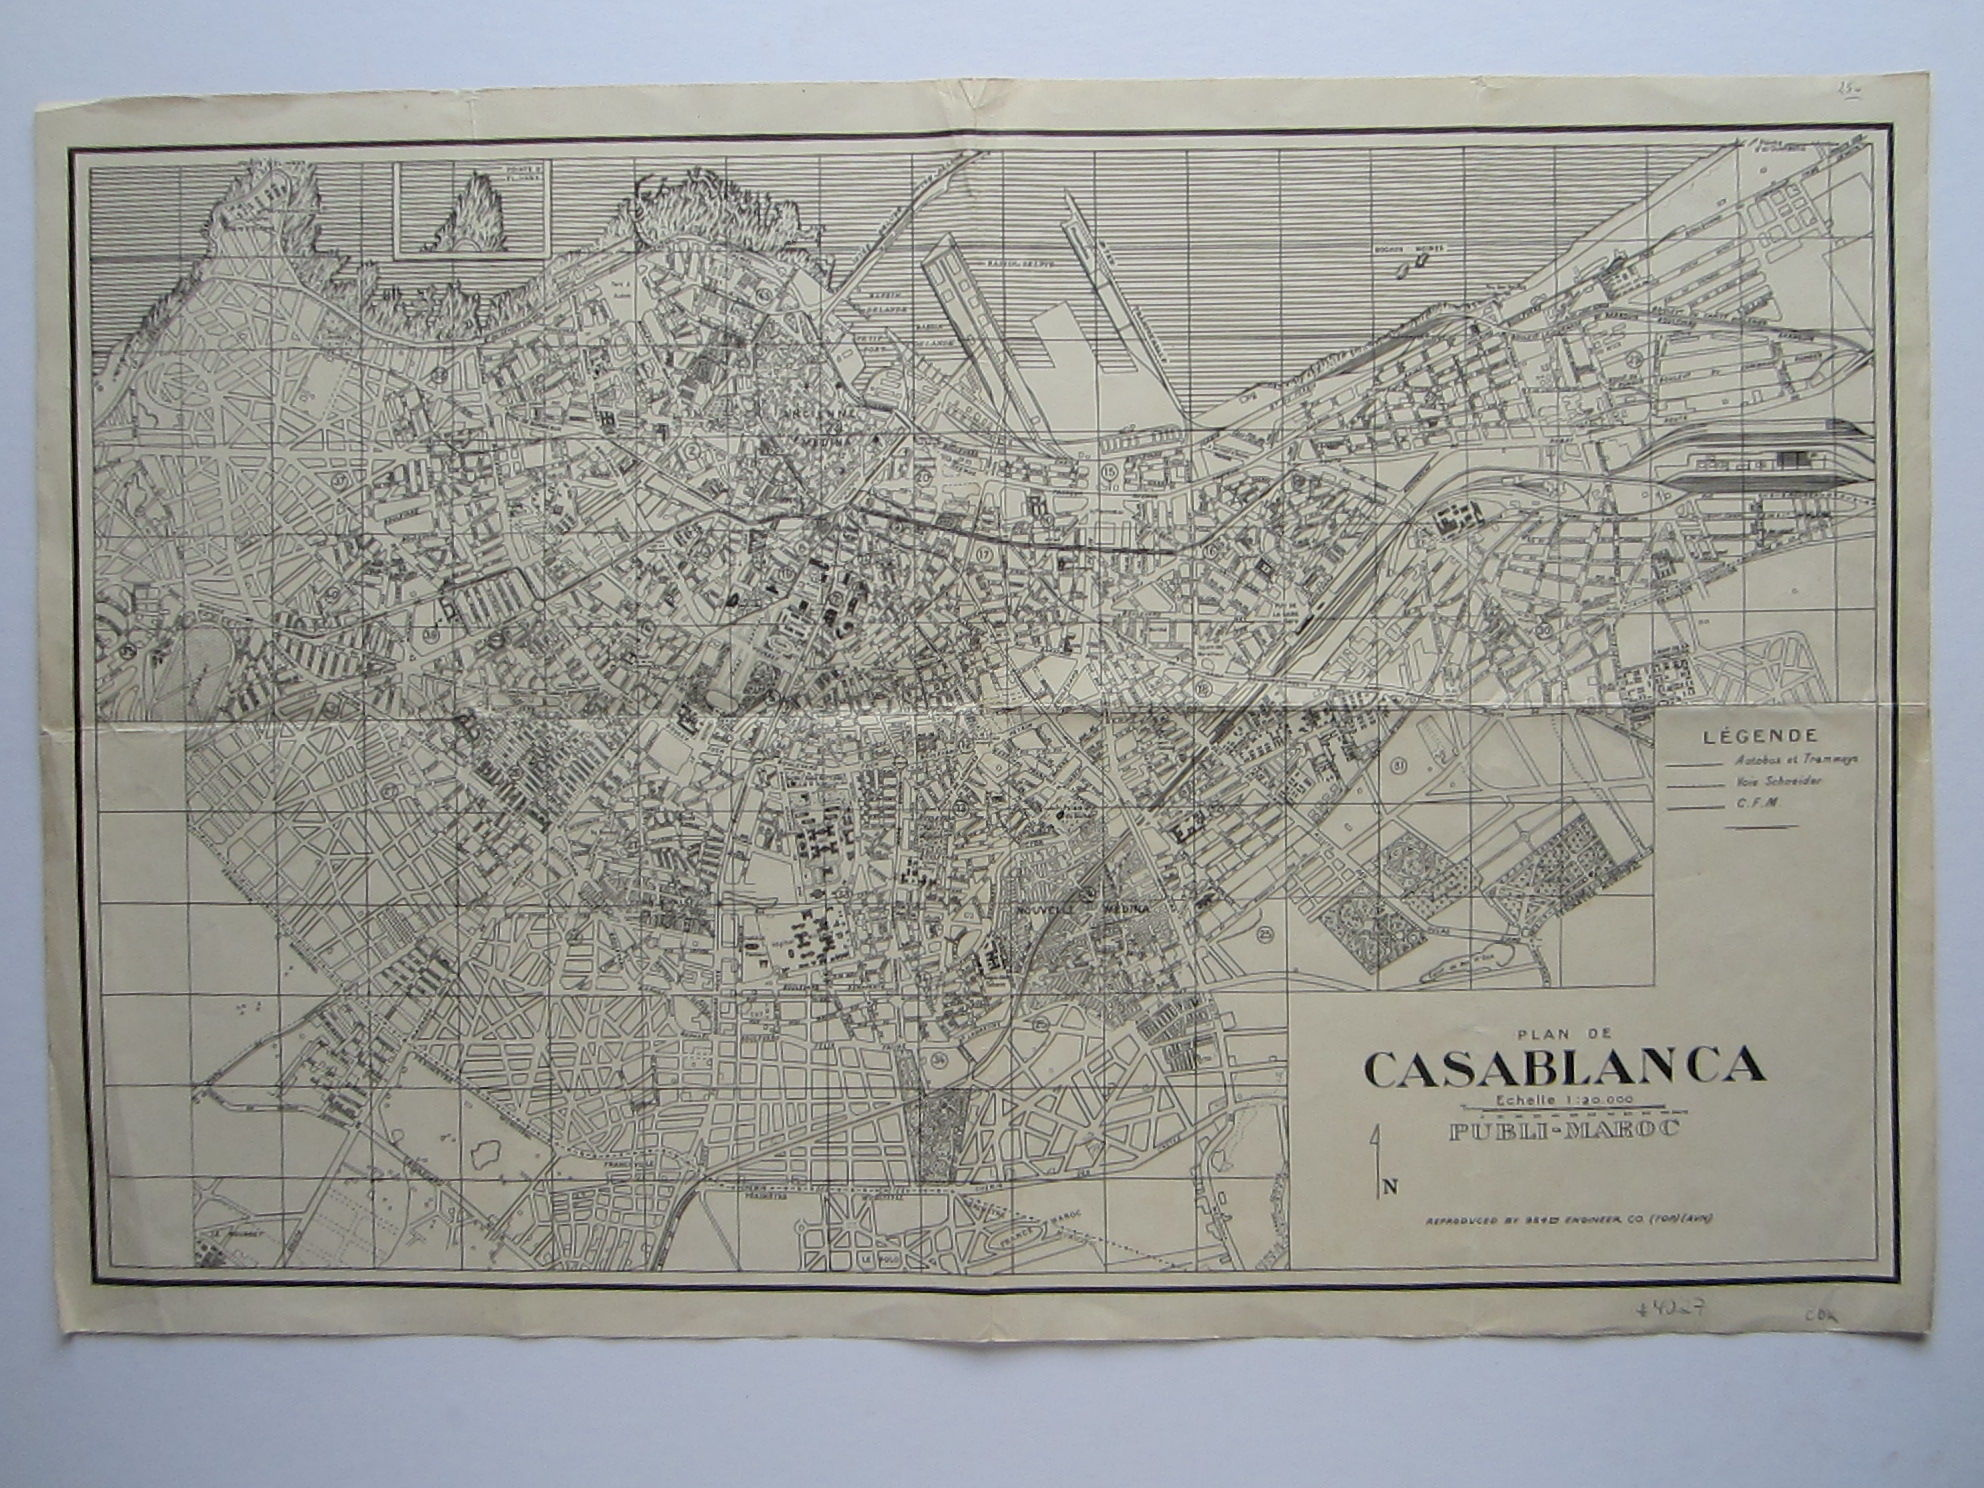 Plan de Casablanca … Reproduced by 954th Engineer Co. (TOP) (AVN) (photo 2)